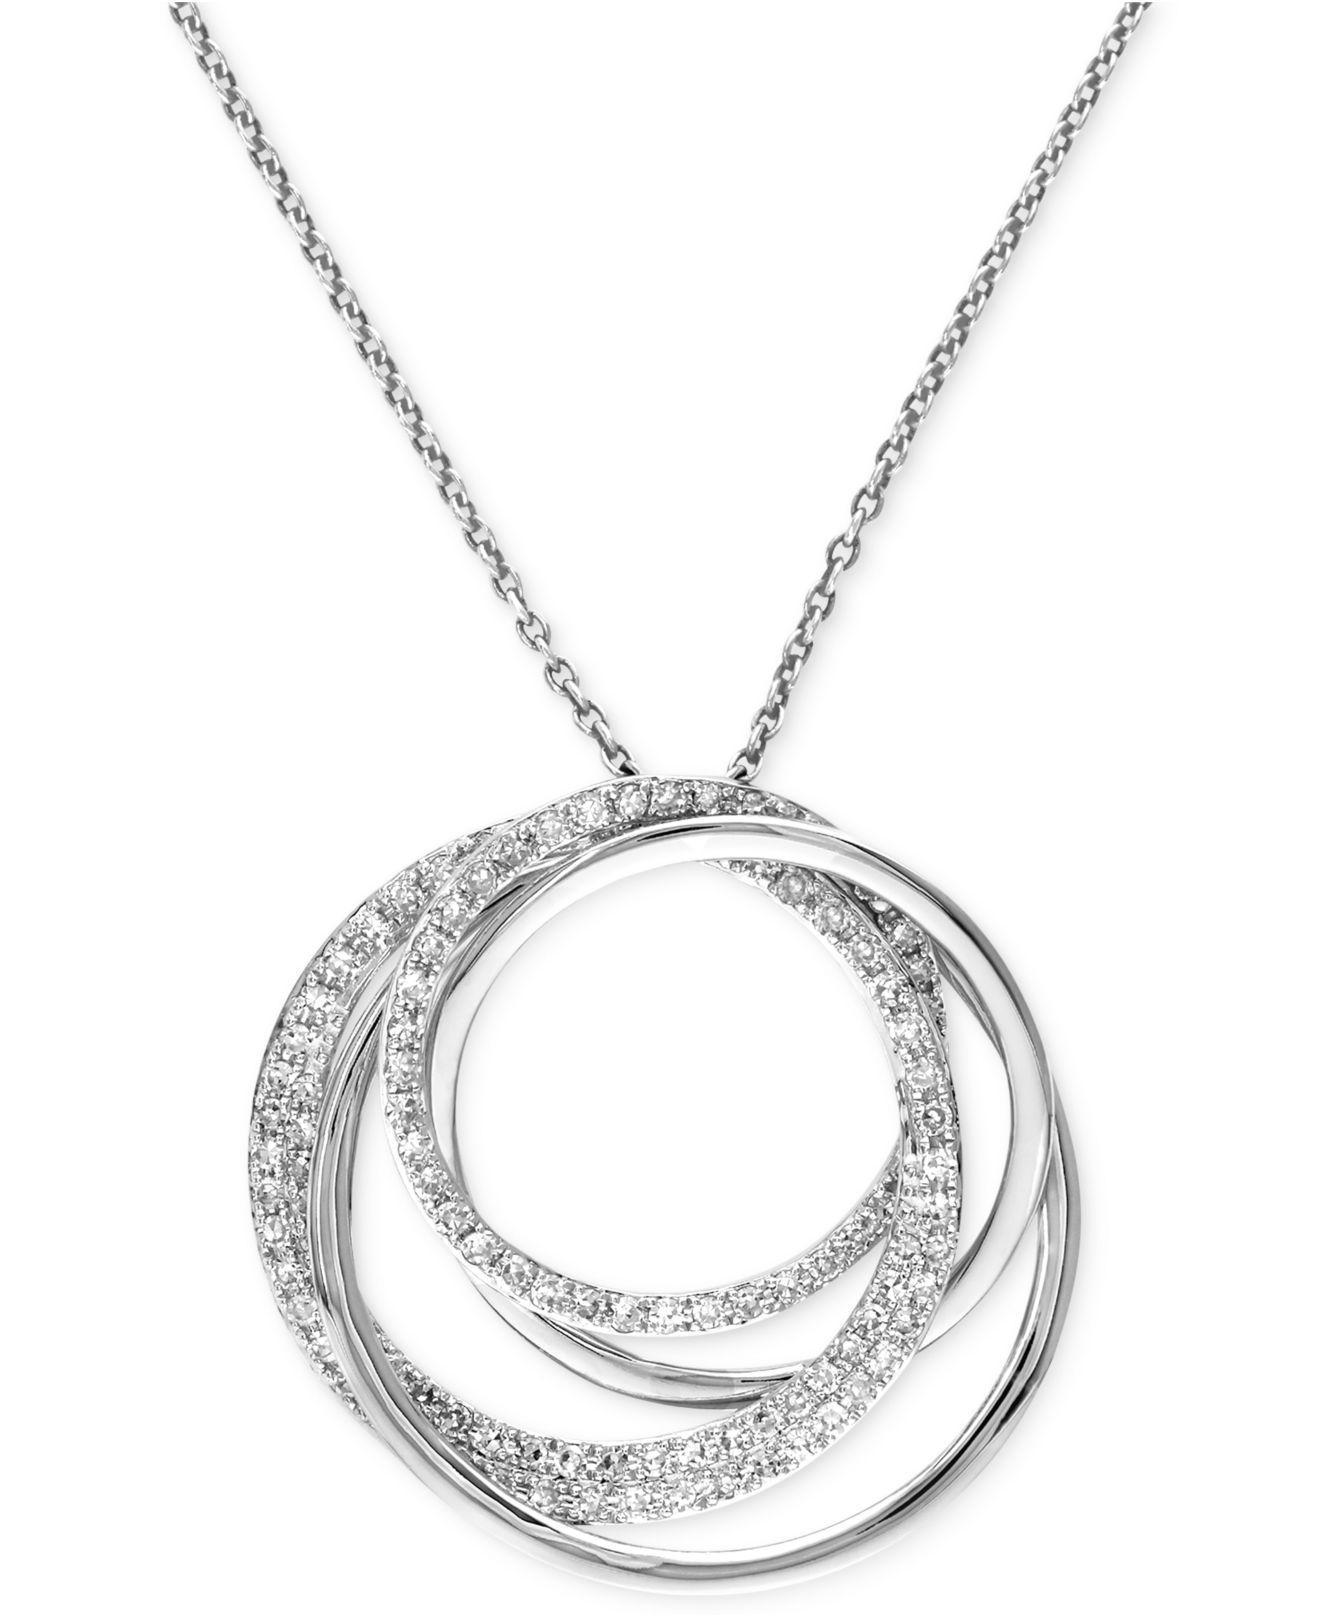 lyst effy collection diamond circle pendant necklace 3. Black Bedroom Furniture Sets. Home Design Ideas